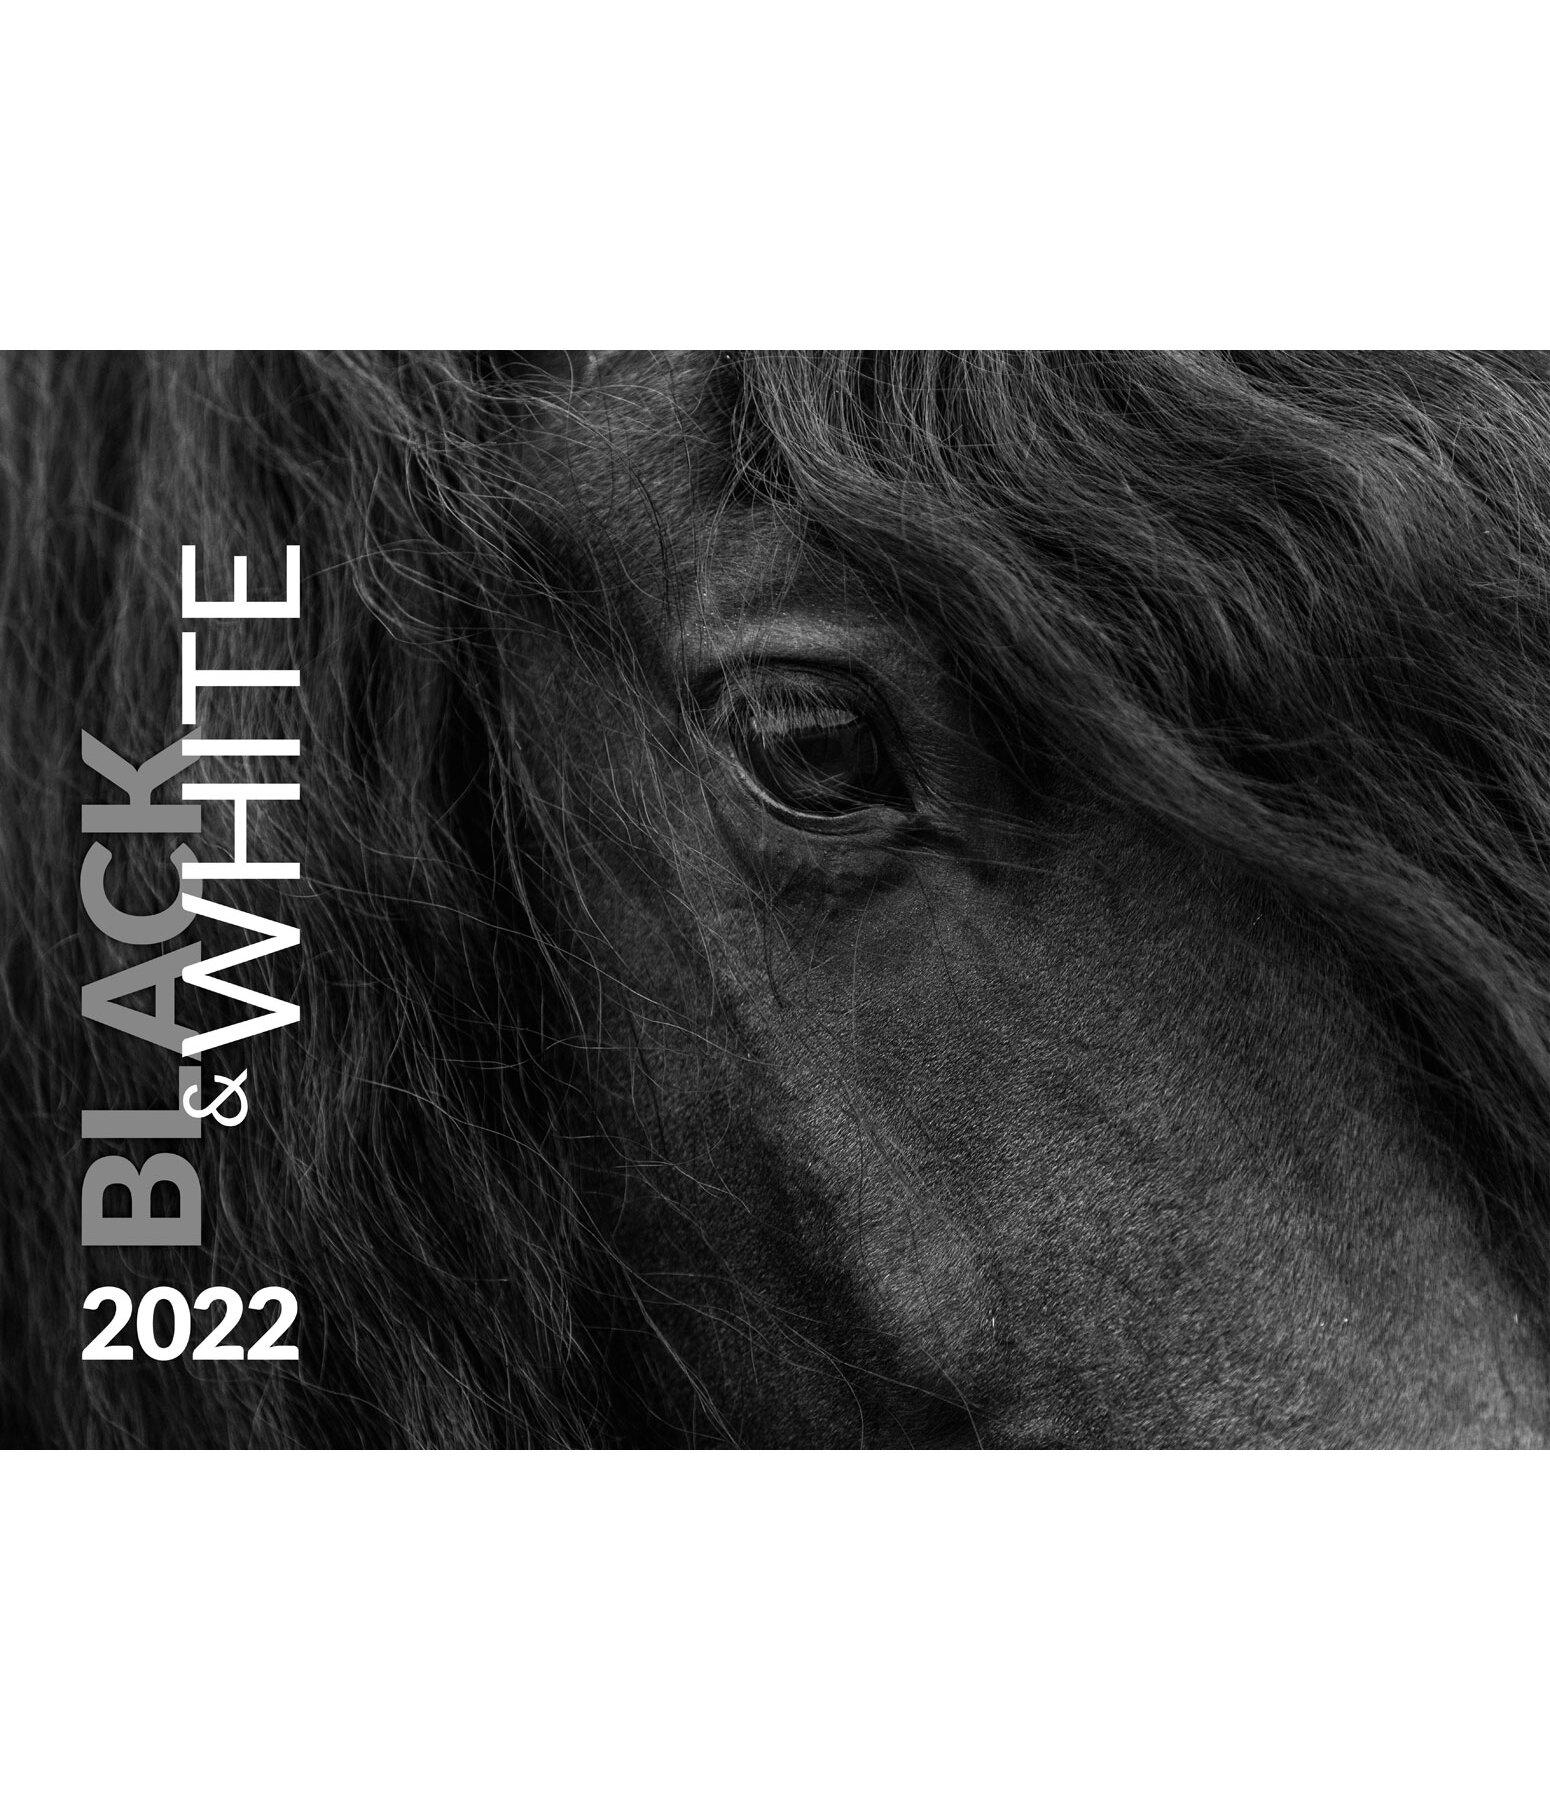 Calendrier noir & blanc artistique 2021   Kramer Equitation